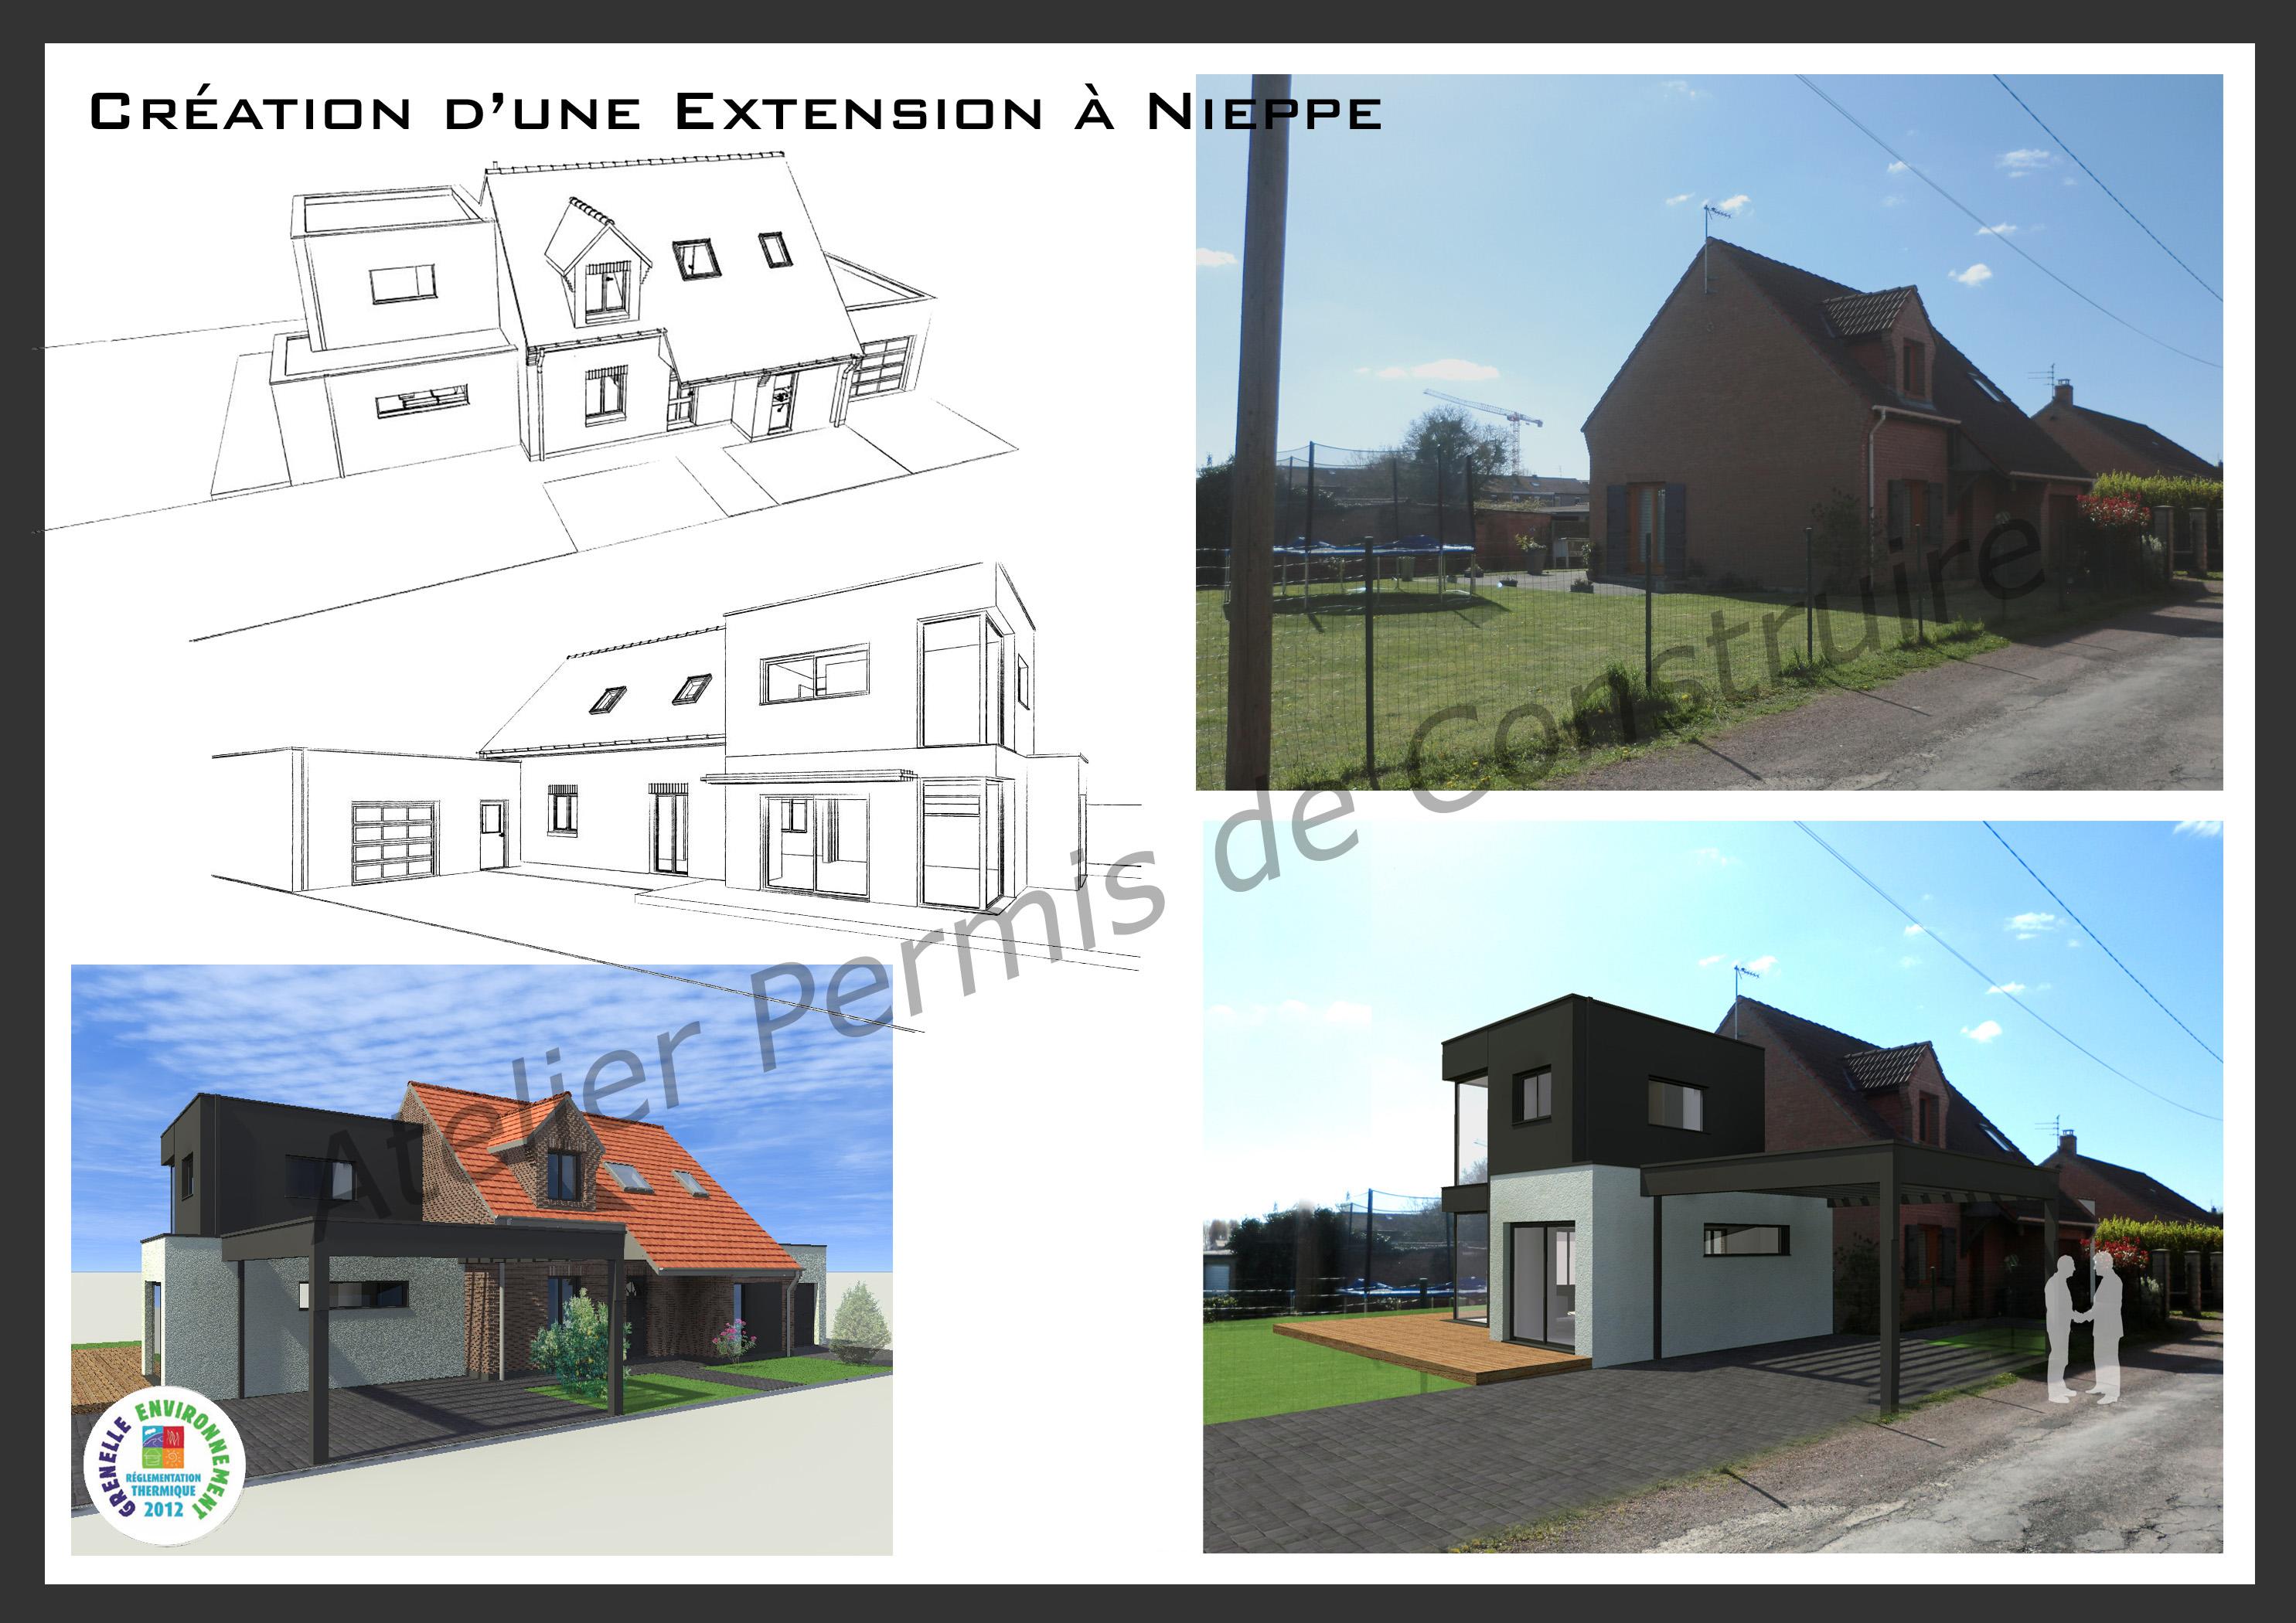 cr ation d 39 une extension moderne nieppe. Black Bedroom Furniture Sets. Home Design Ideas